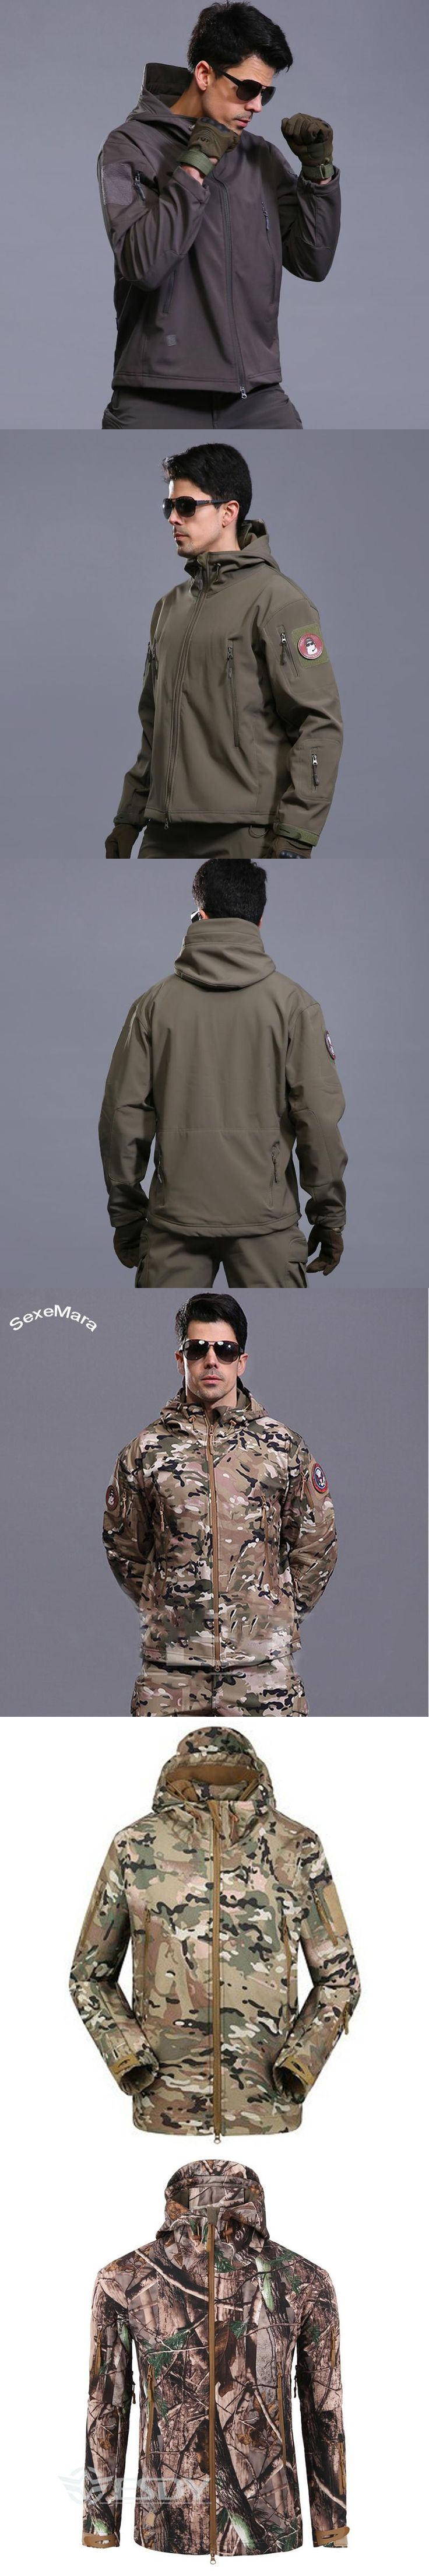 SexeMara Winter Army Softshell Militar Tactical Jacket Men Casual Hooded Mens Outdoors Jackets Chaqueta Hombre Waterproof Coats